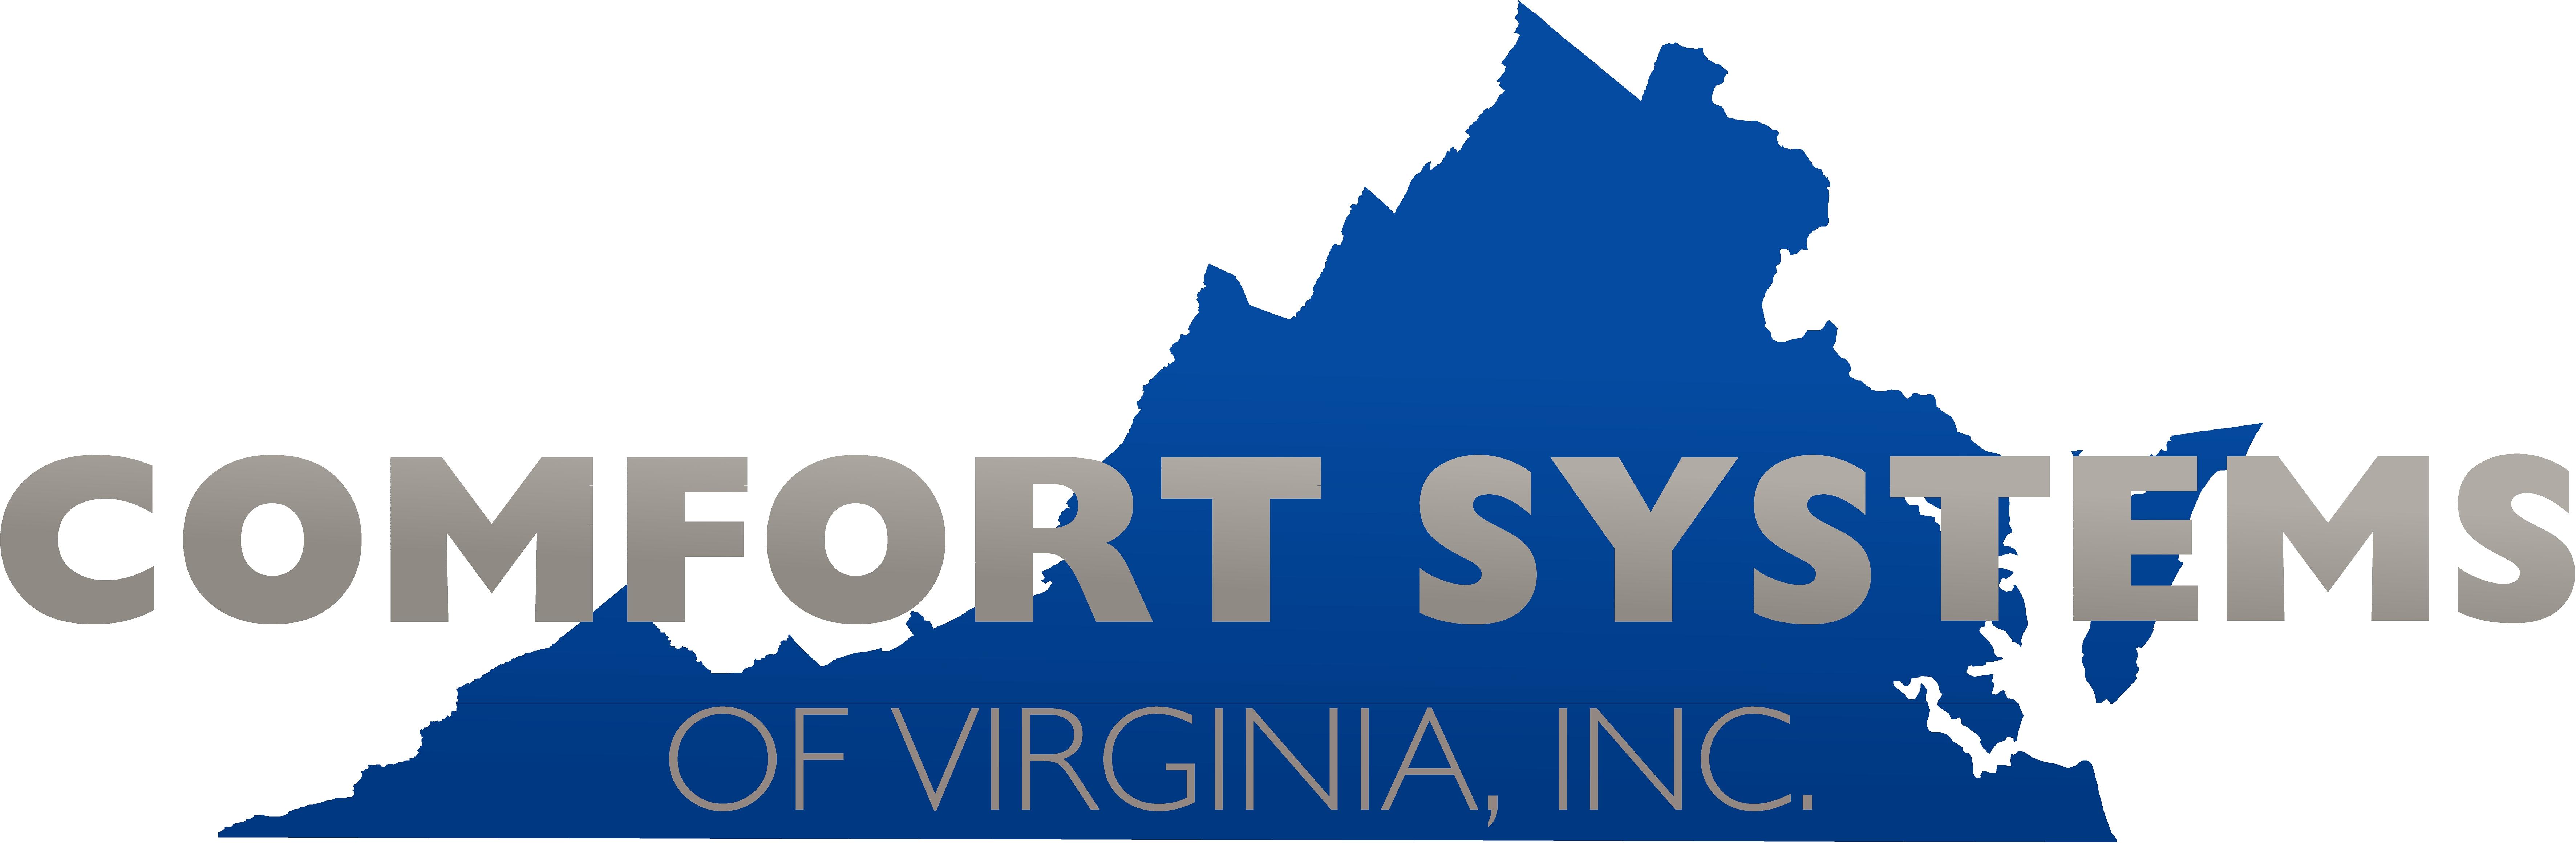 Comfort Systems of Virginia logo